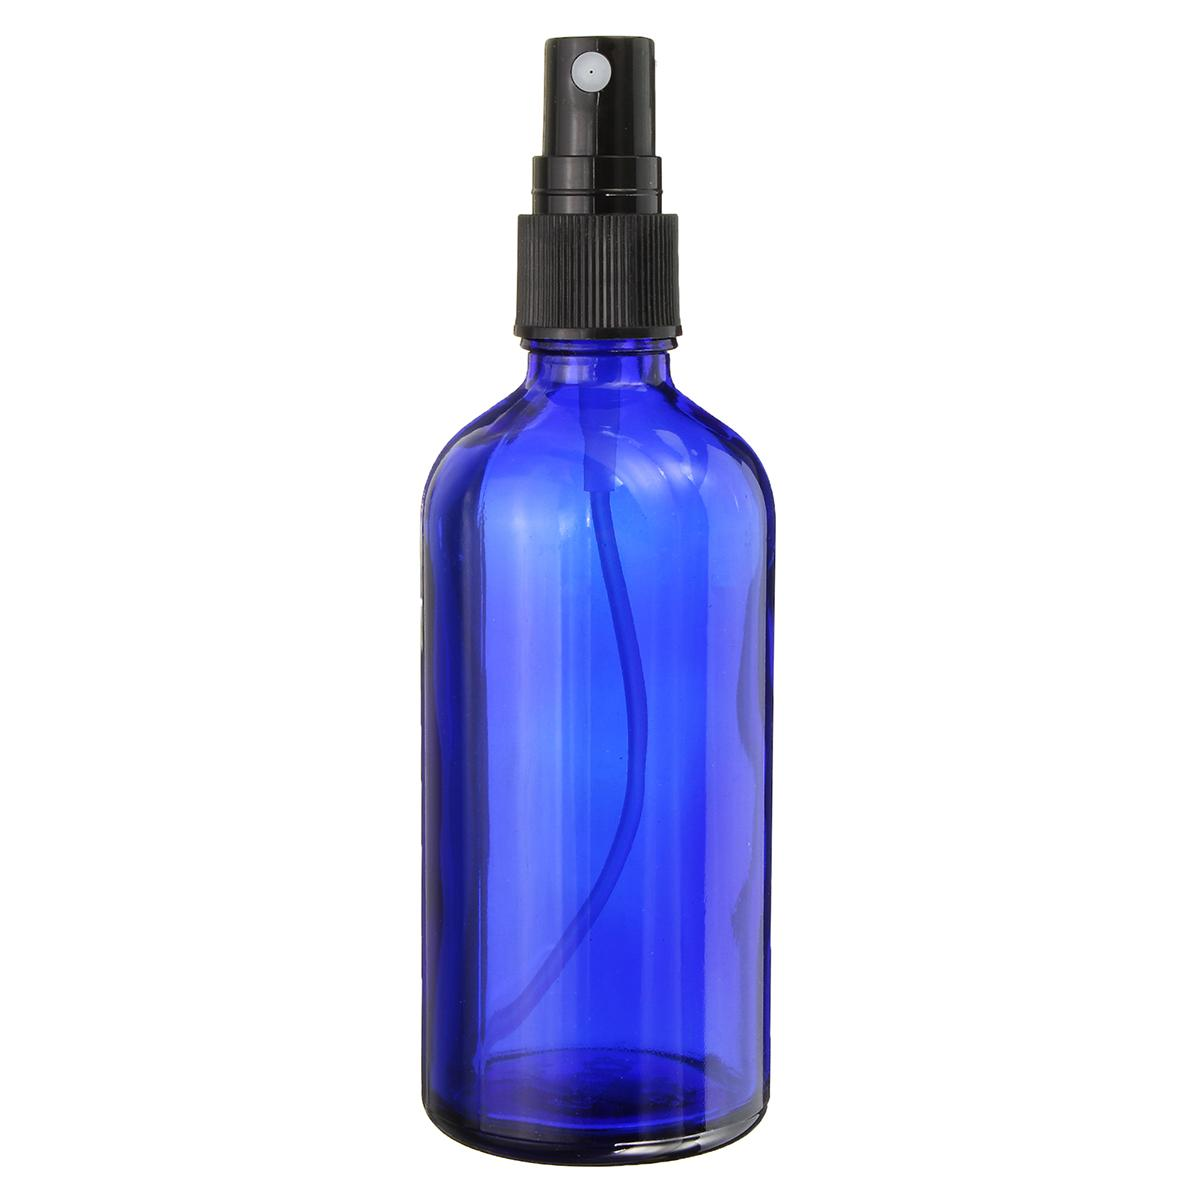 35 unids100 ml Azul Vacío Perfume Spray Botella de Vidrio Aceite Esencial Líquido Rociador Dispensador de Viaje Fina Menta Atomizador Envase Cosmético